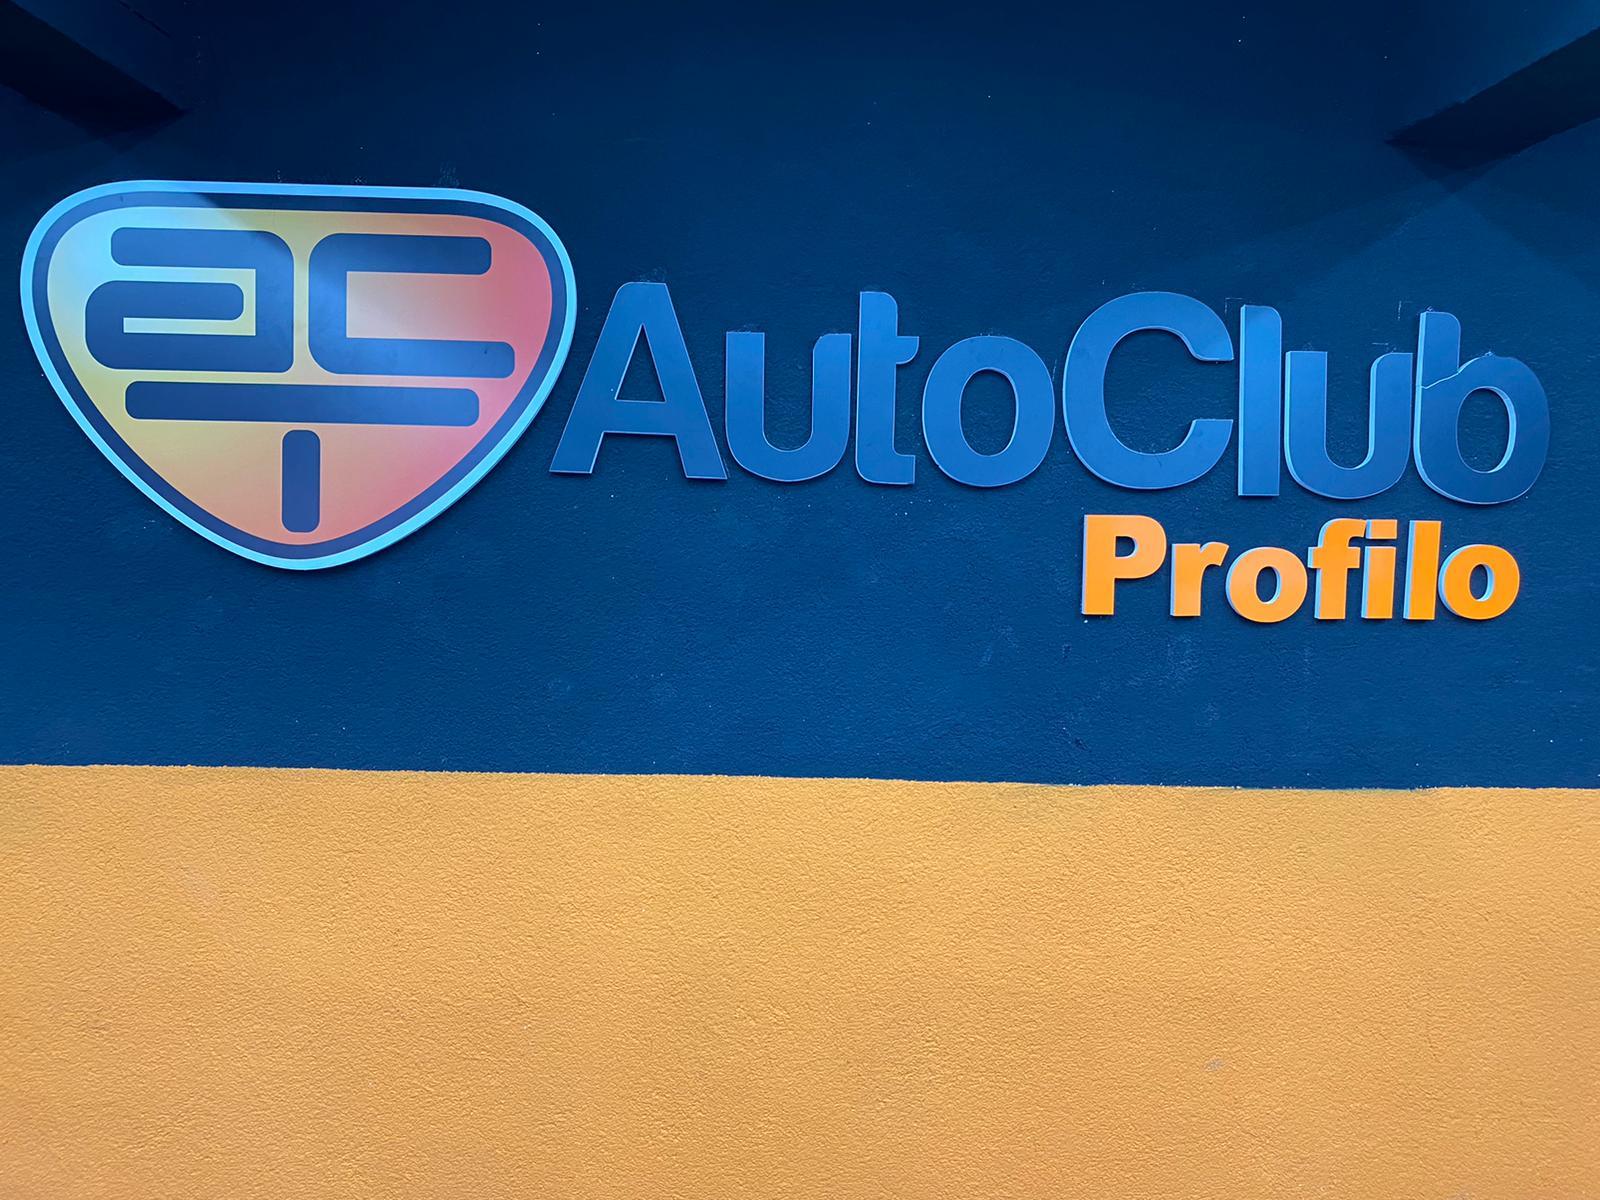 AutoClub Profilo - İstanbul Mecidiyeköy